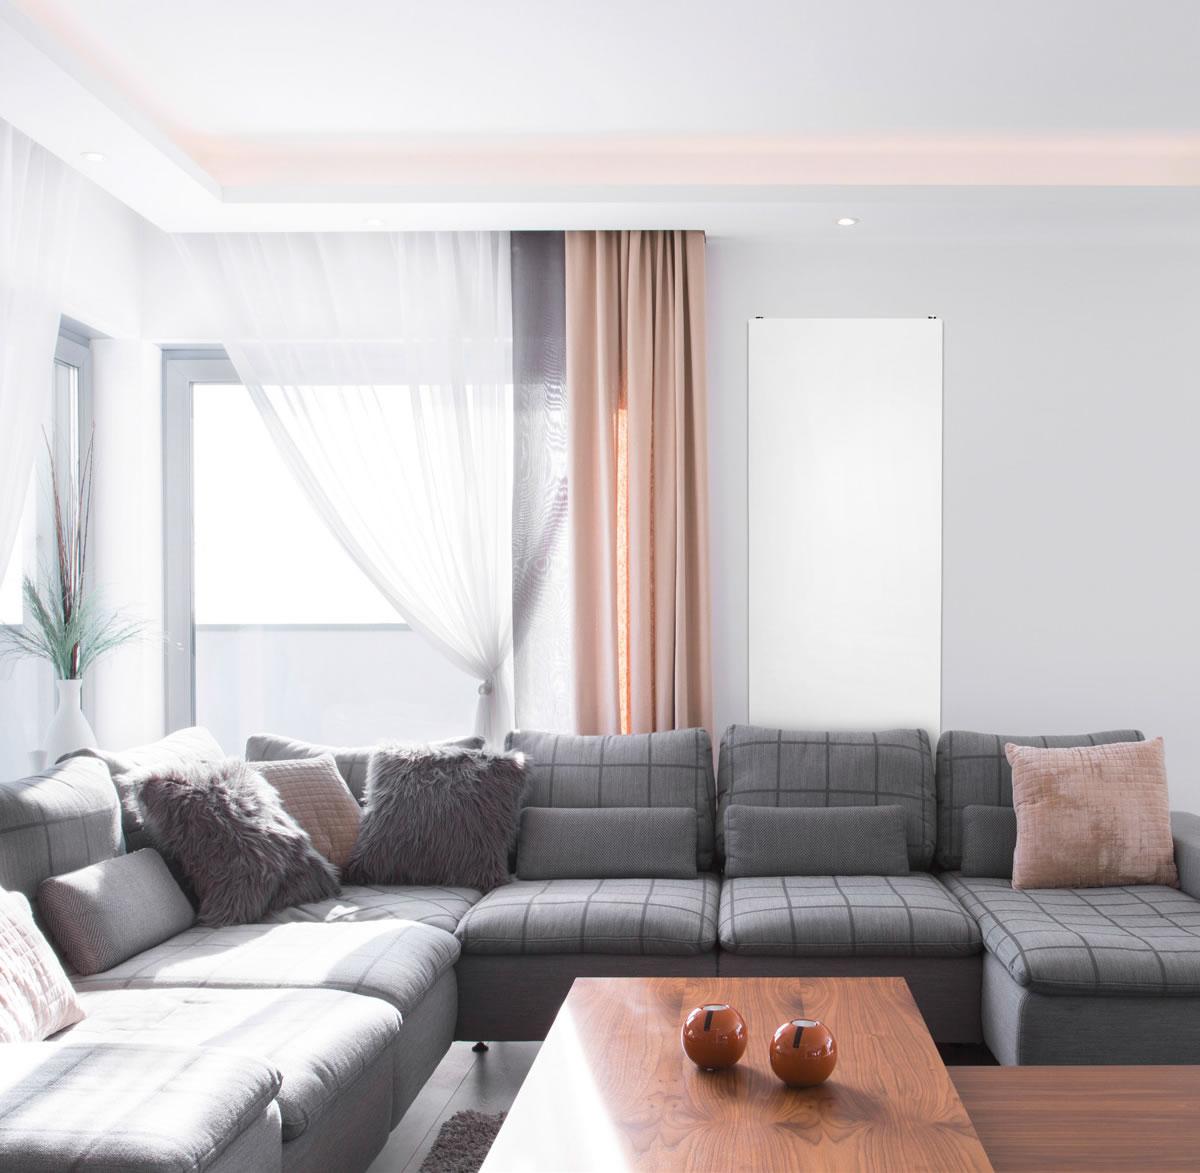 buderus logatrend cv plan vertikal heizk rper h mm l 900 mm typ 21 2256 1416 watt. Black Bedroom Furniture Sets. Home Design Ideas